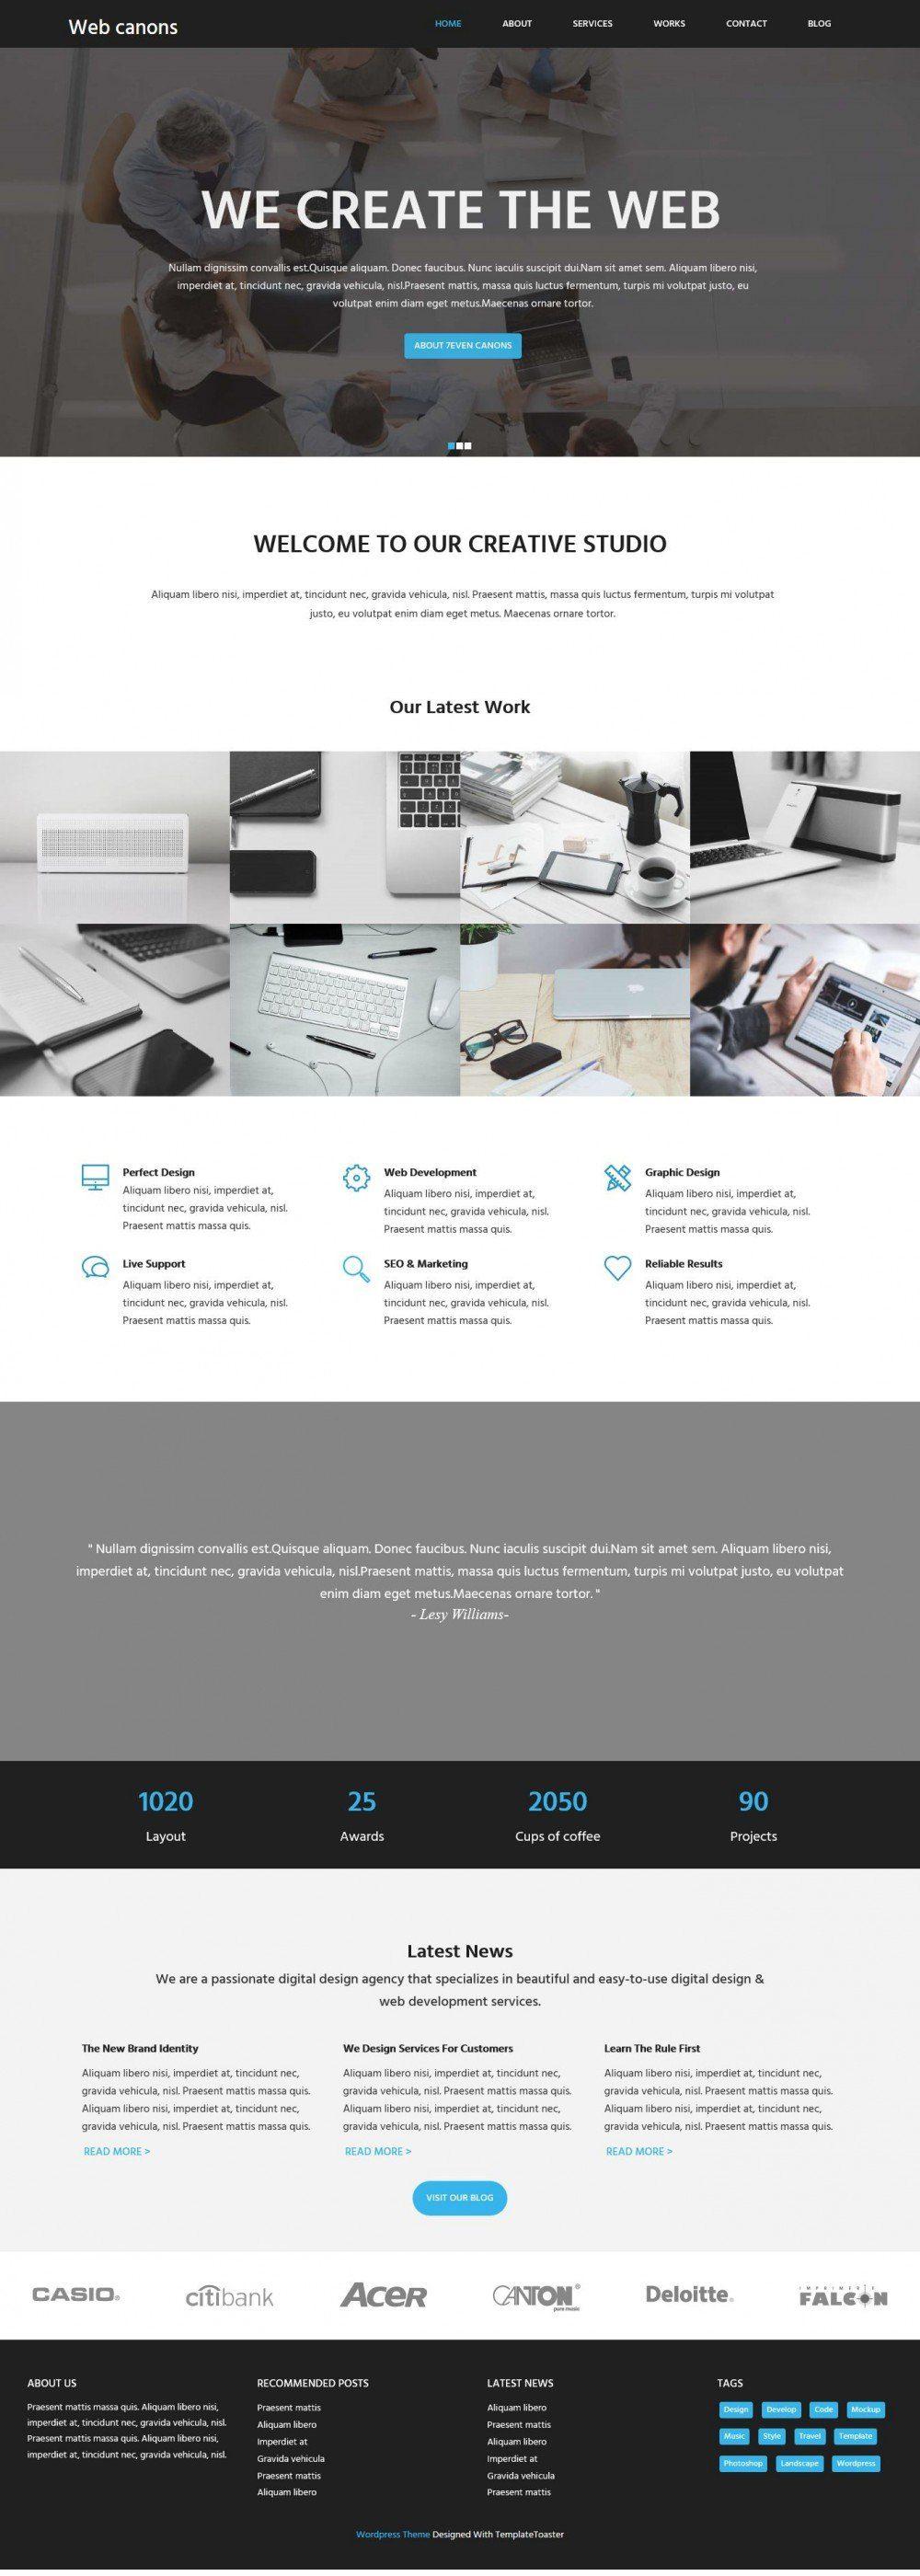 Web Canons Corporate Web Agency Studio Blogger Template